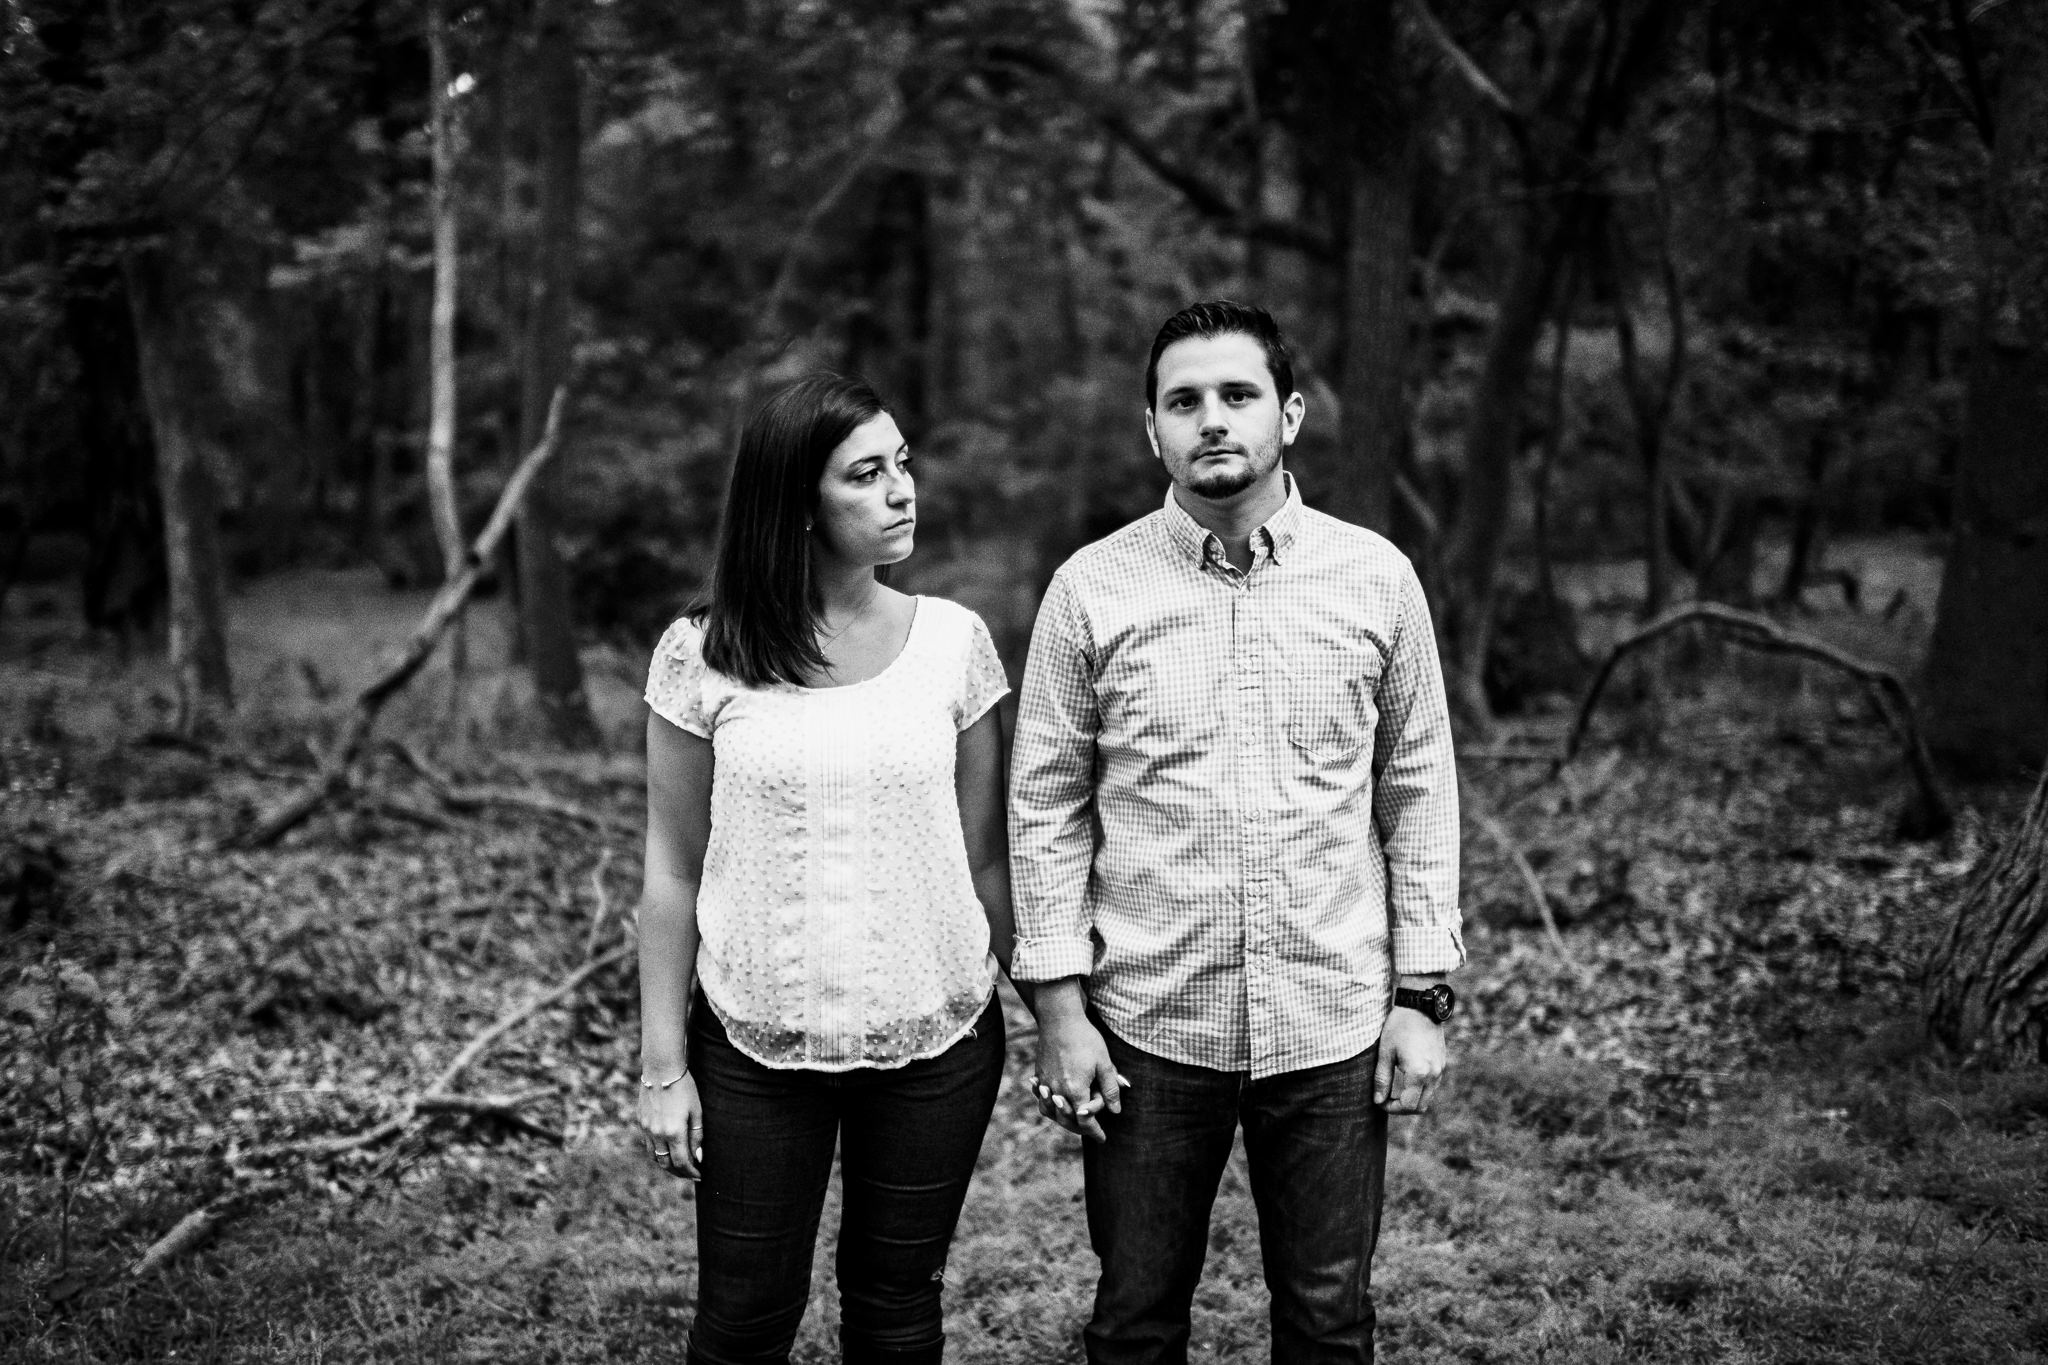 Gilbert-Allaire-State-Park-NJ-Engagement-Photos-10.JPG